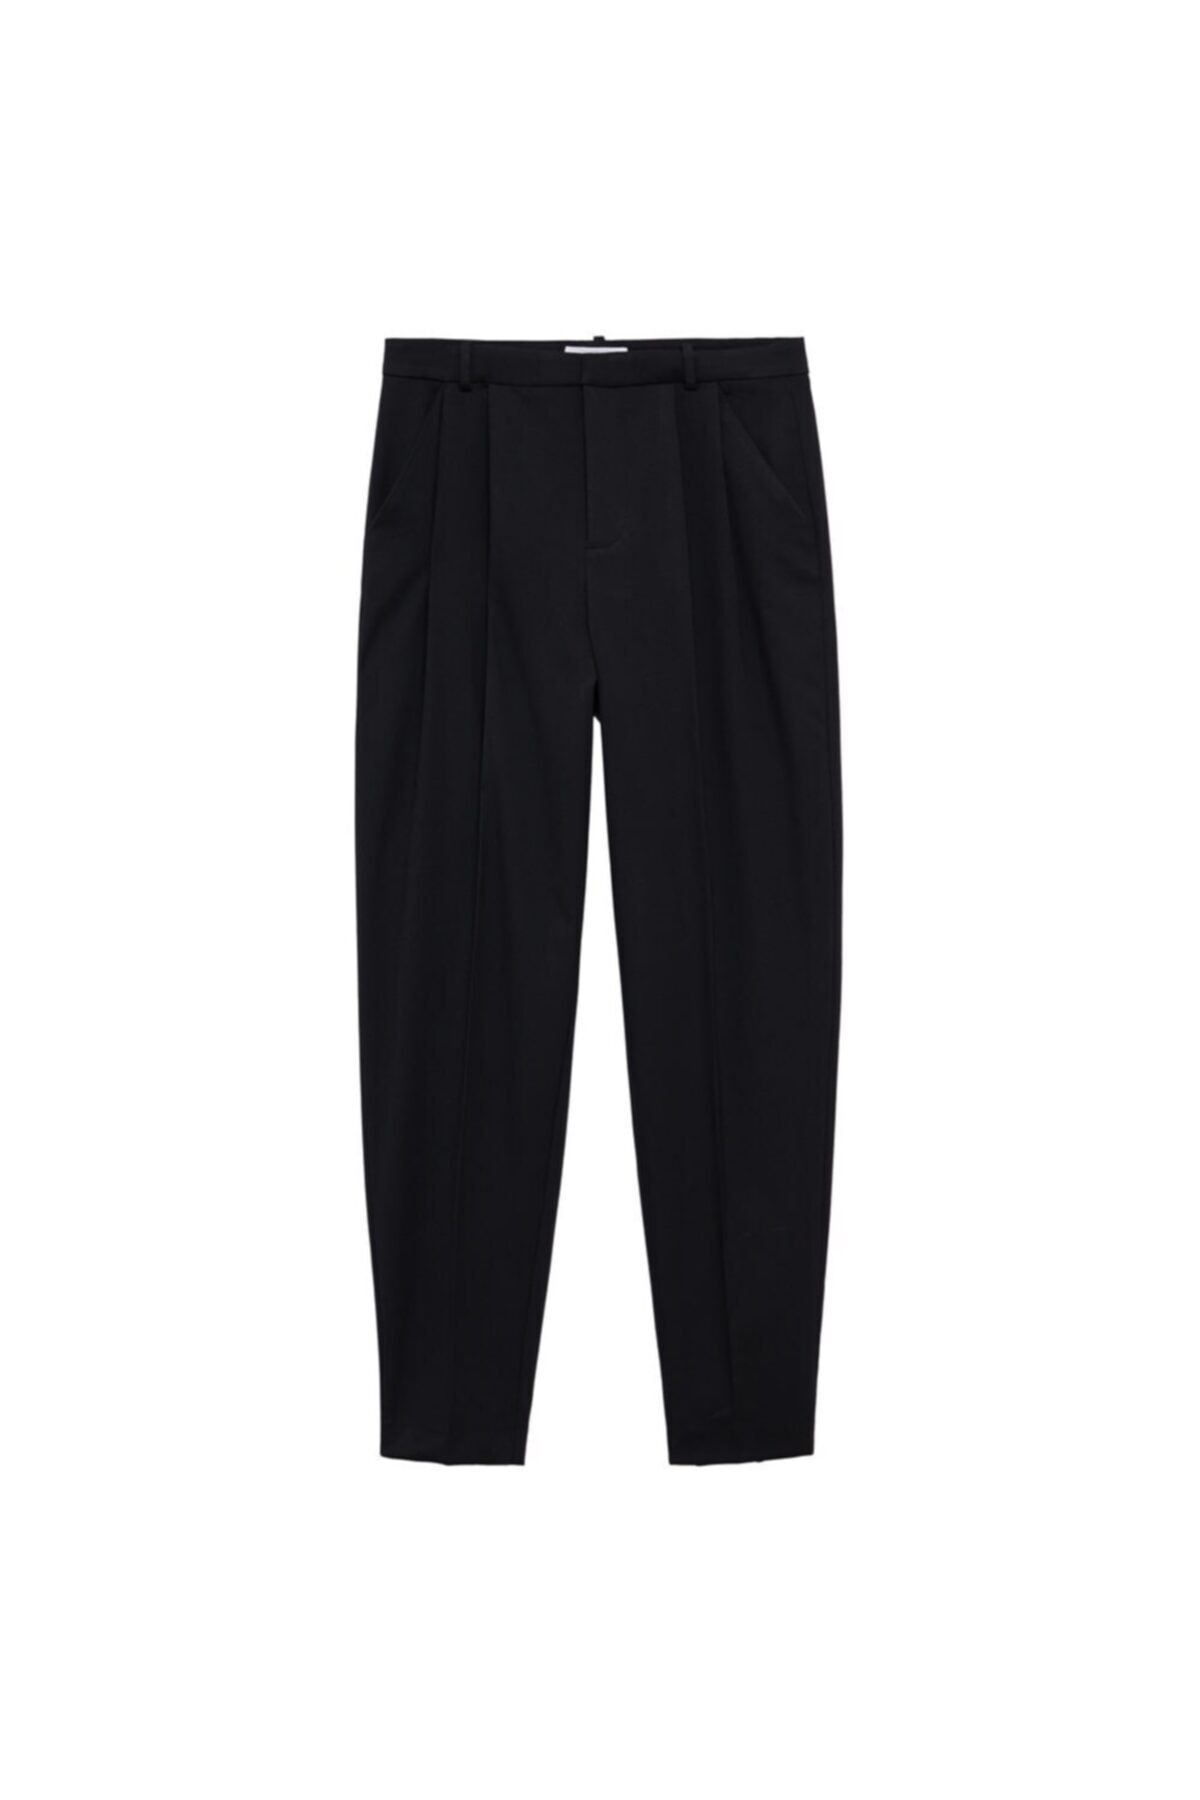 MANGO Woman Kadın Siyah Cepli Pantolon 2